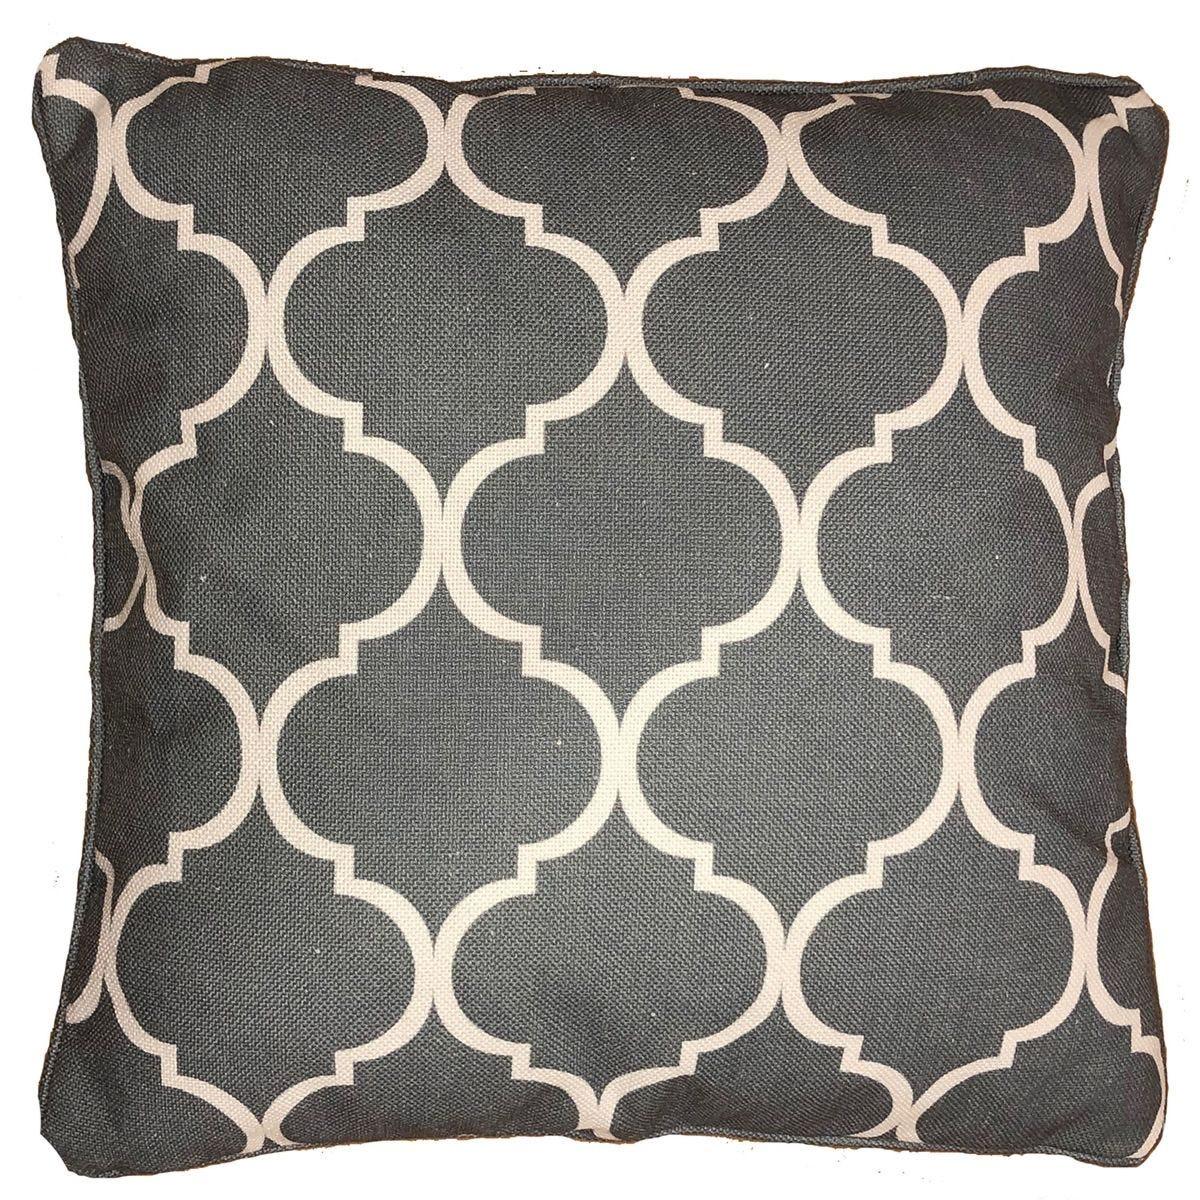 Greenhurst Harmony Square Scatter Cushion - Grey